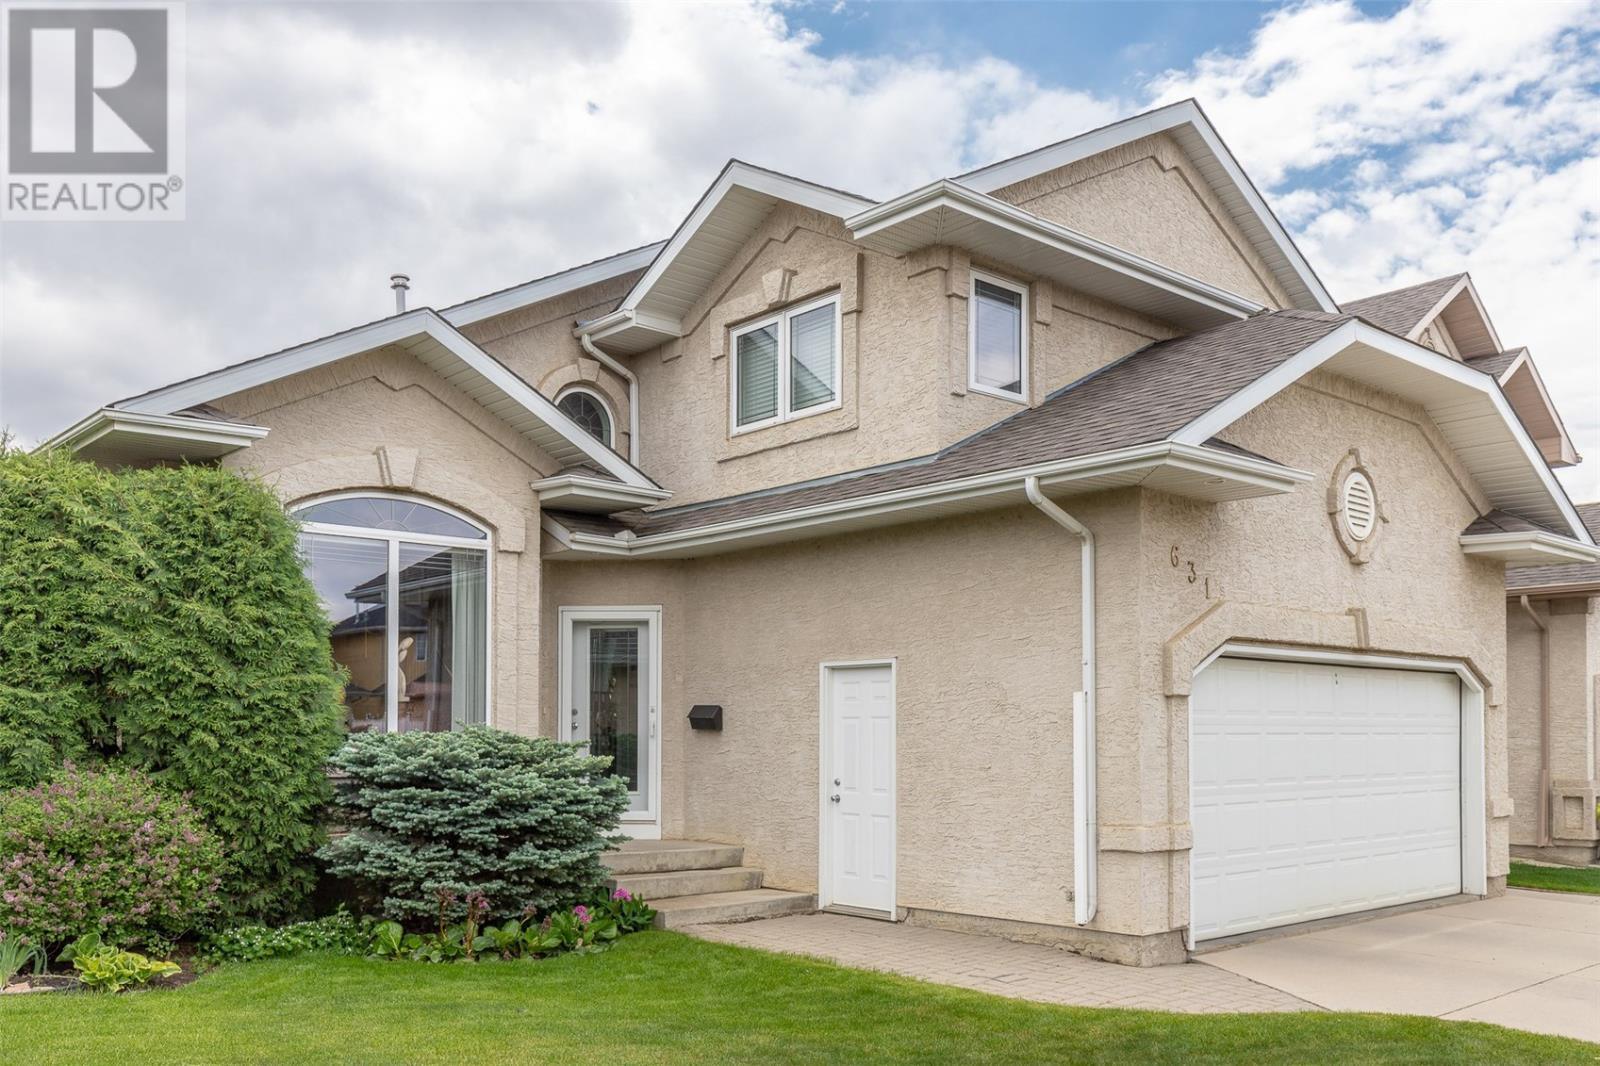 Removed: 631 Budz Crescent, Saskatoon, SK - Removed on 2019-08-20 18:18:11